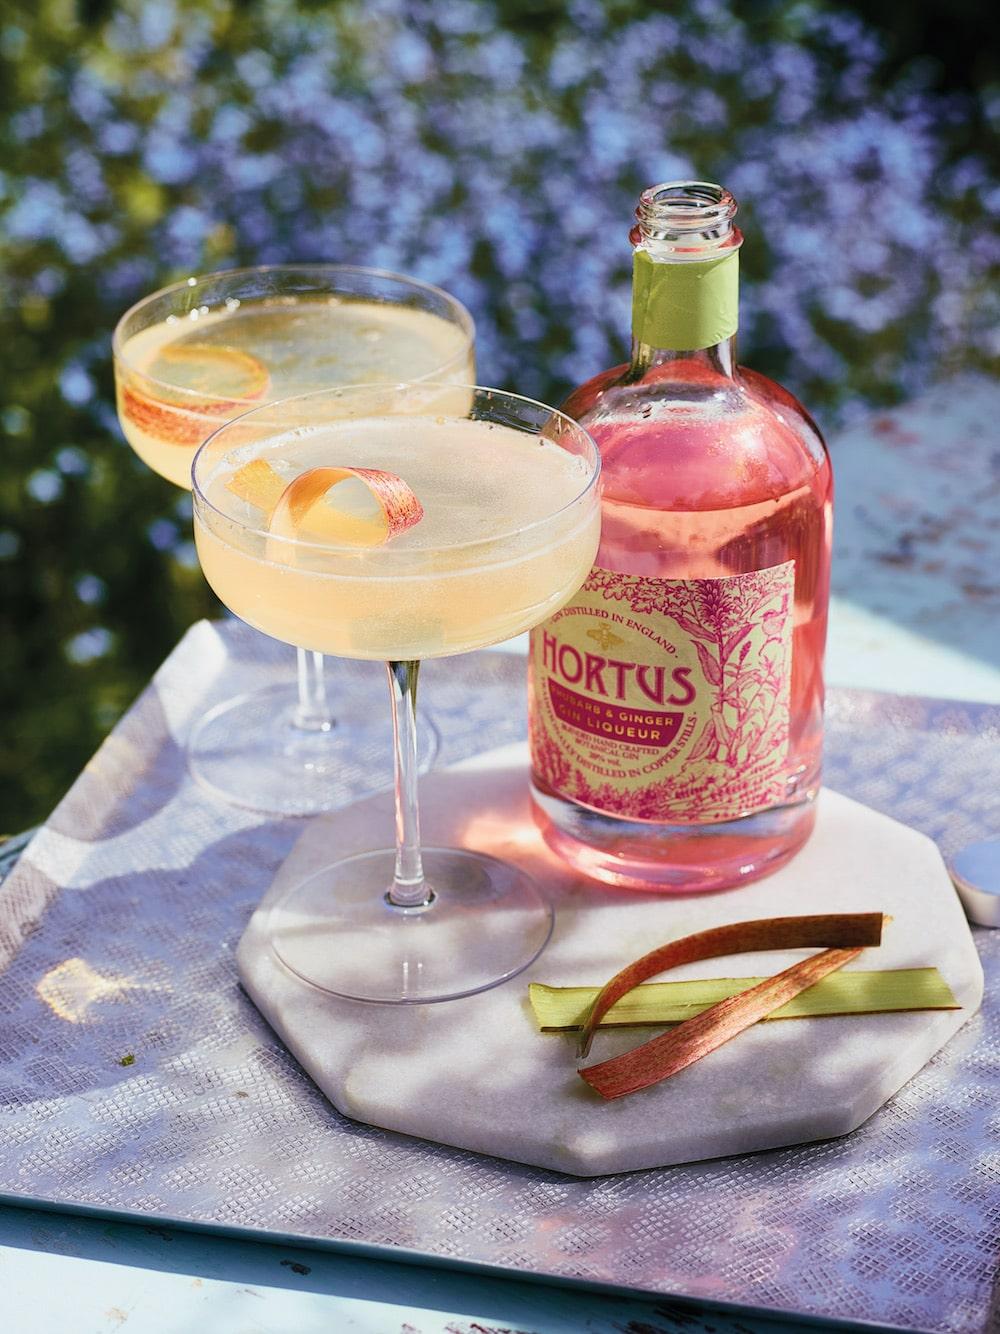 Lidl Hortus Rhubarb & Gin